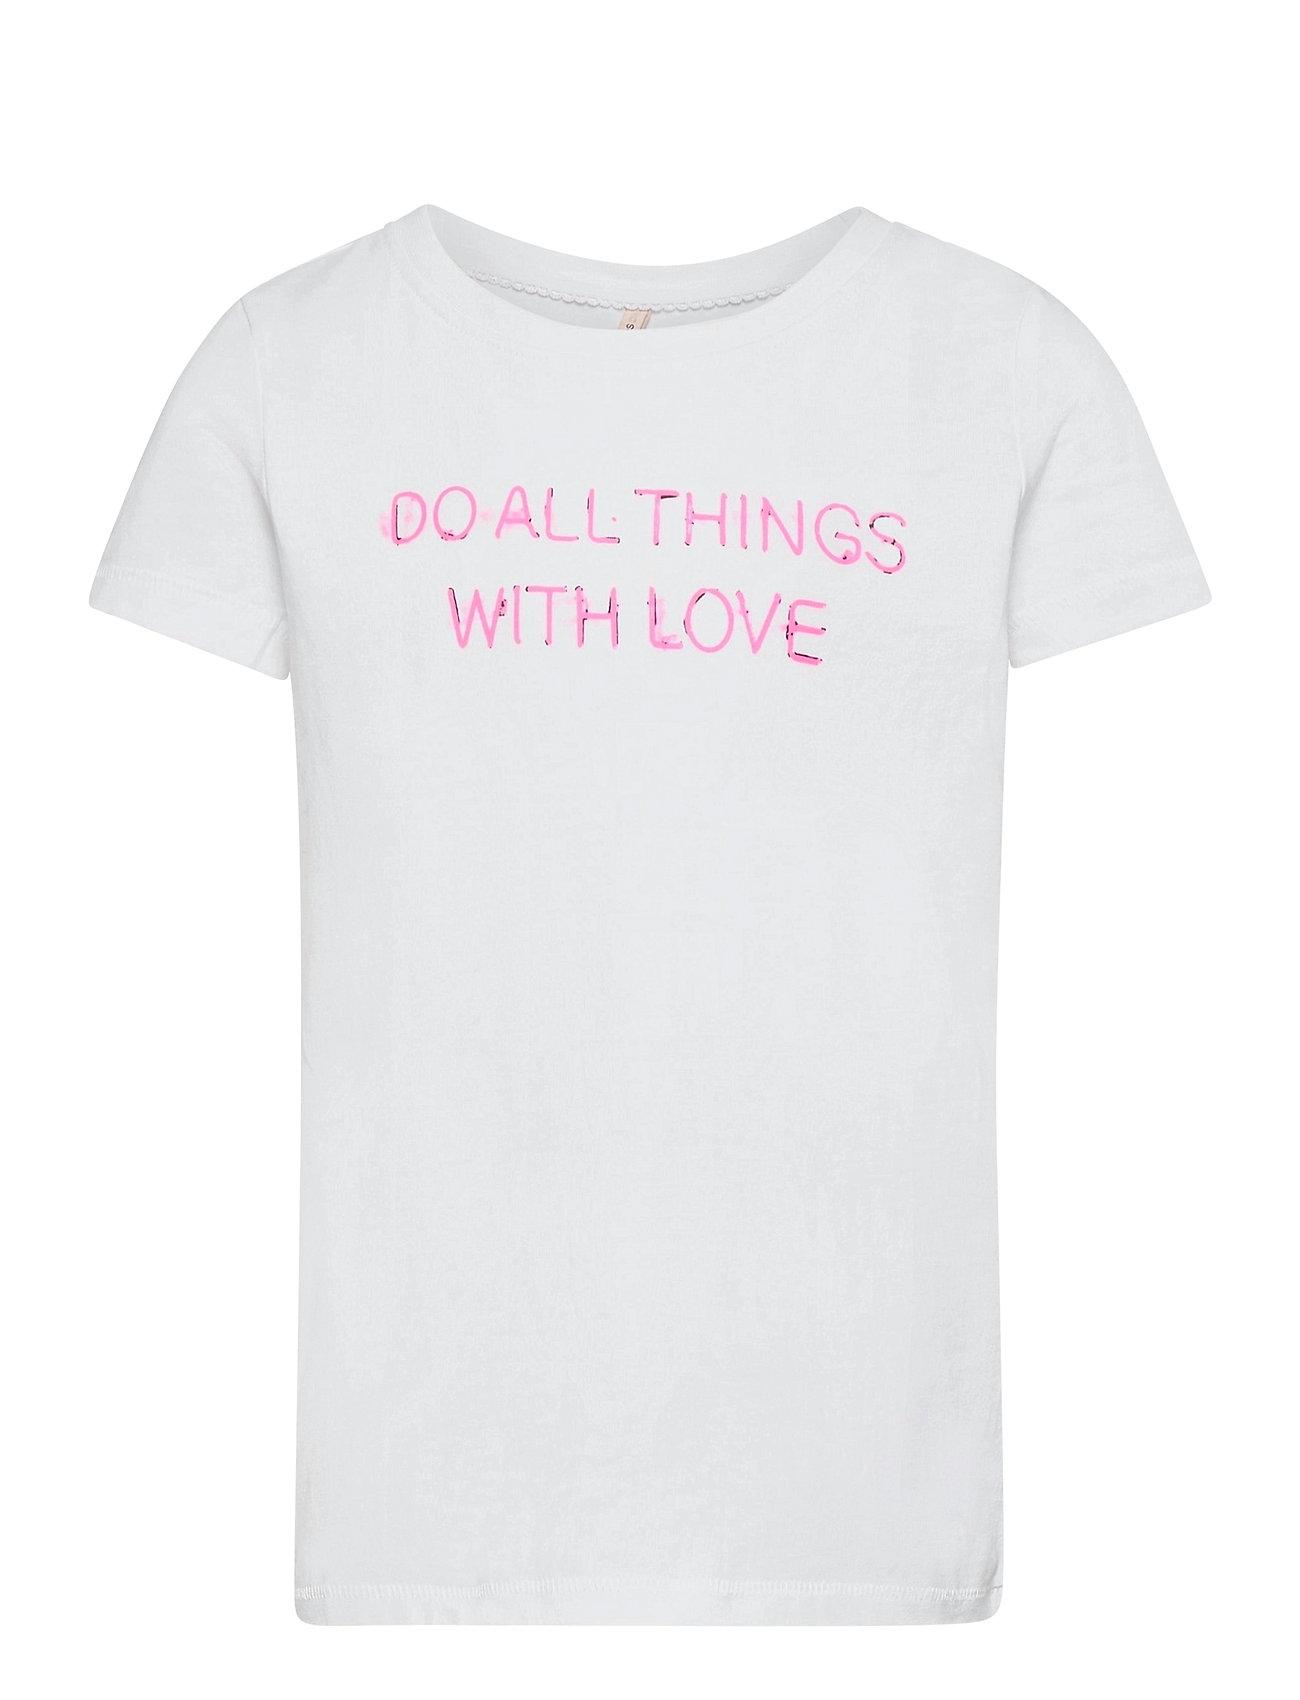 Kids Only - KONCHLOE LIFE BOXY S/S BOX TOP JRS - t-shirts - bright white - 0